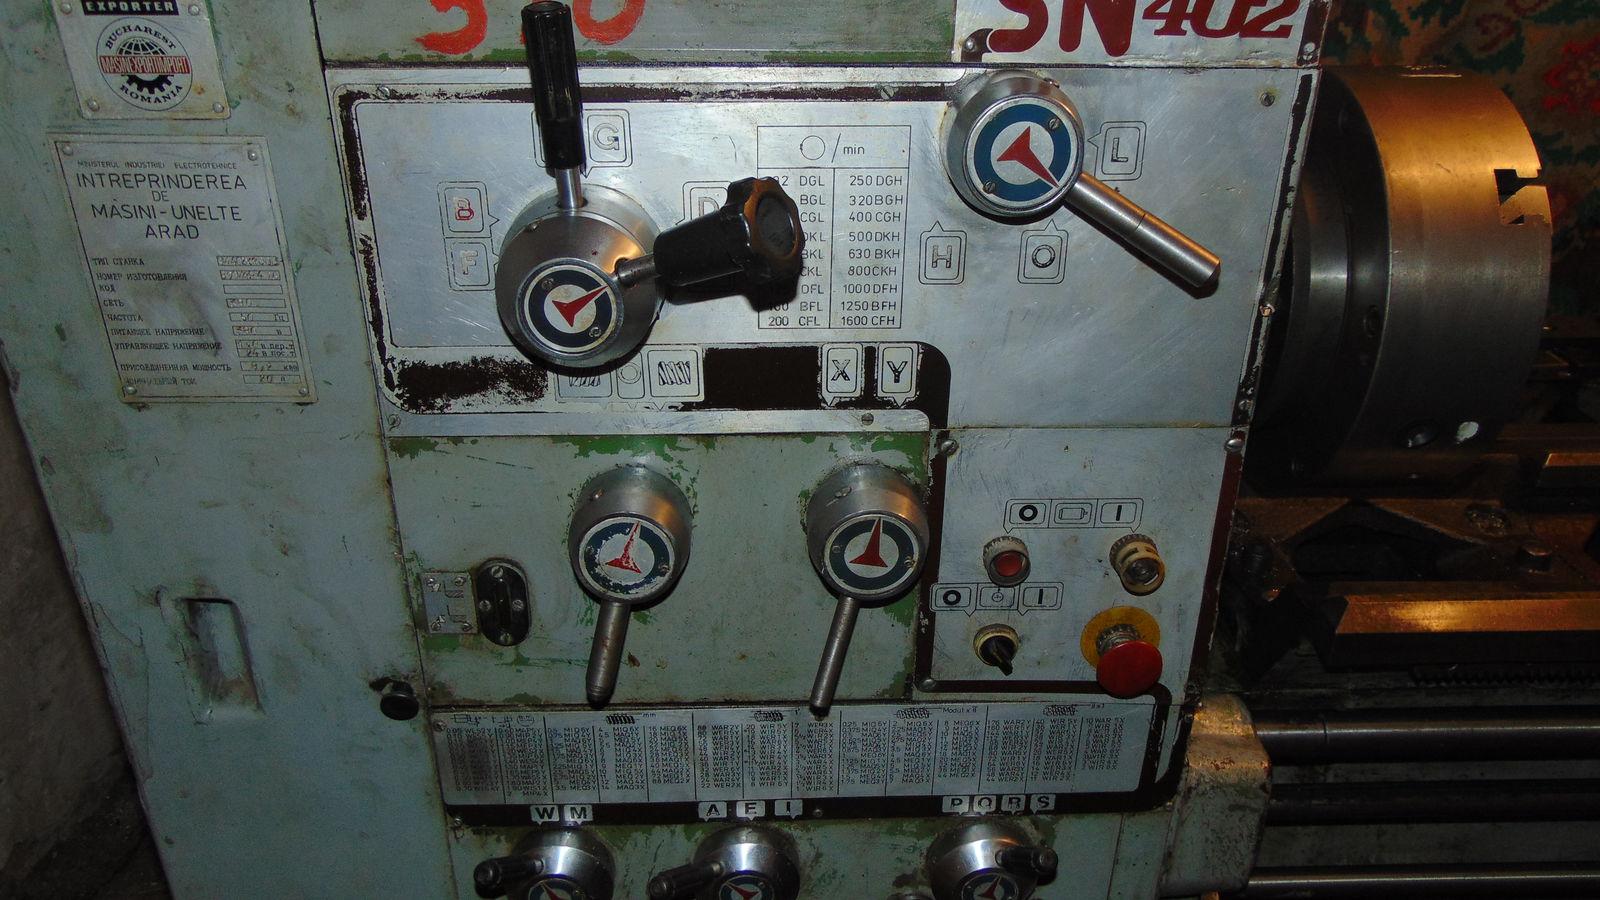 sn- 402